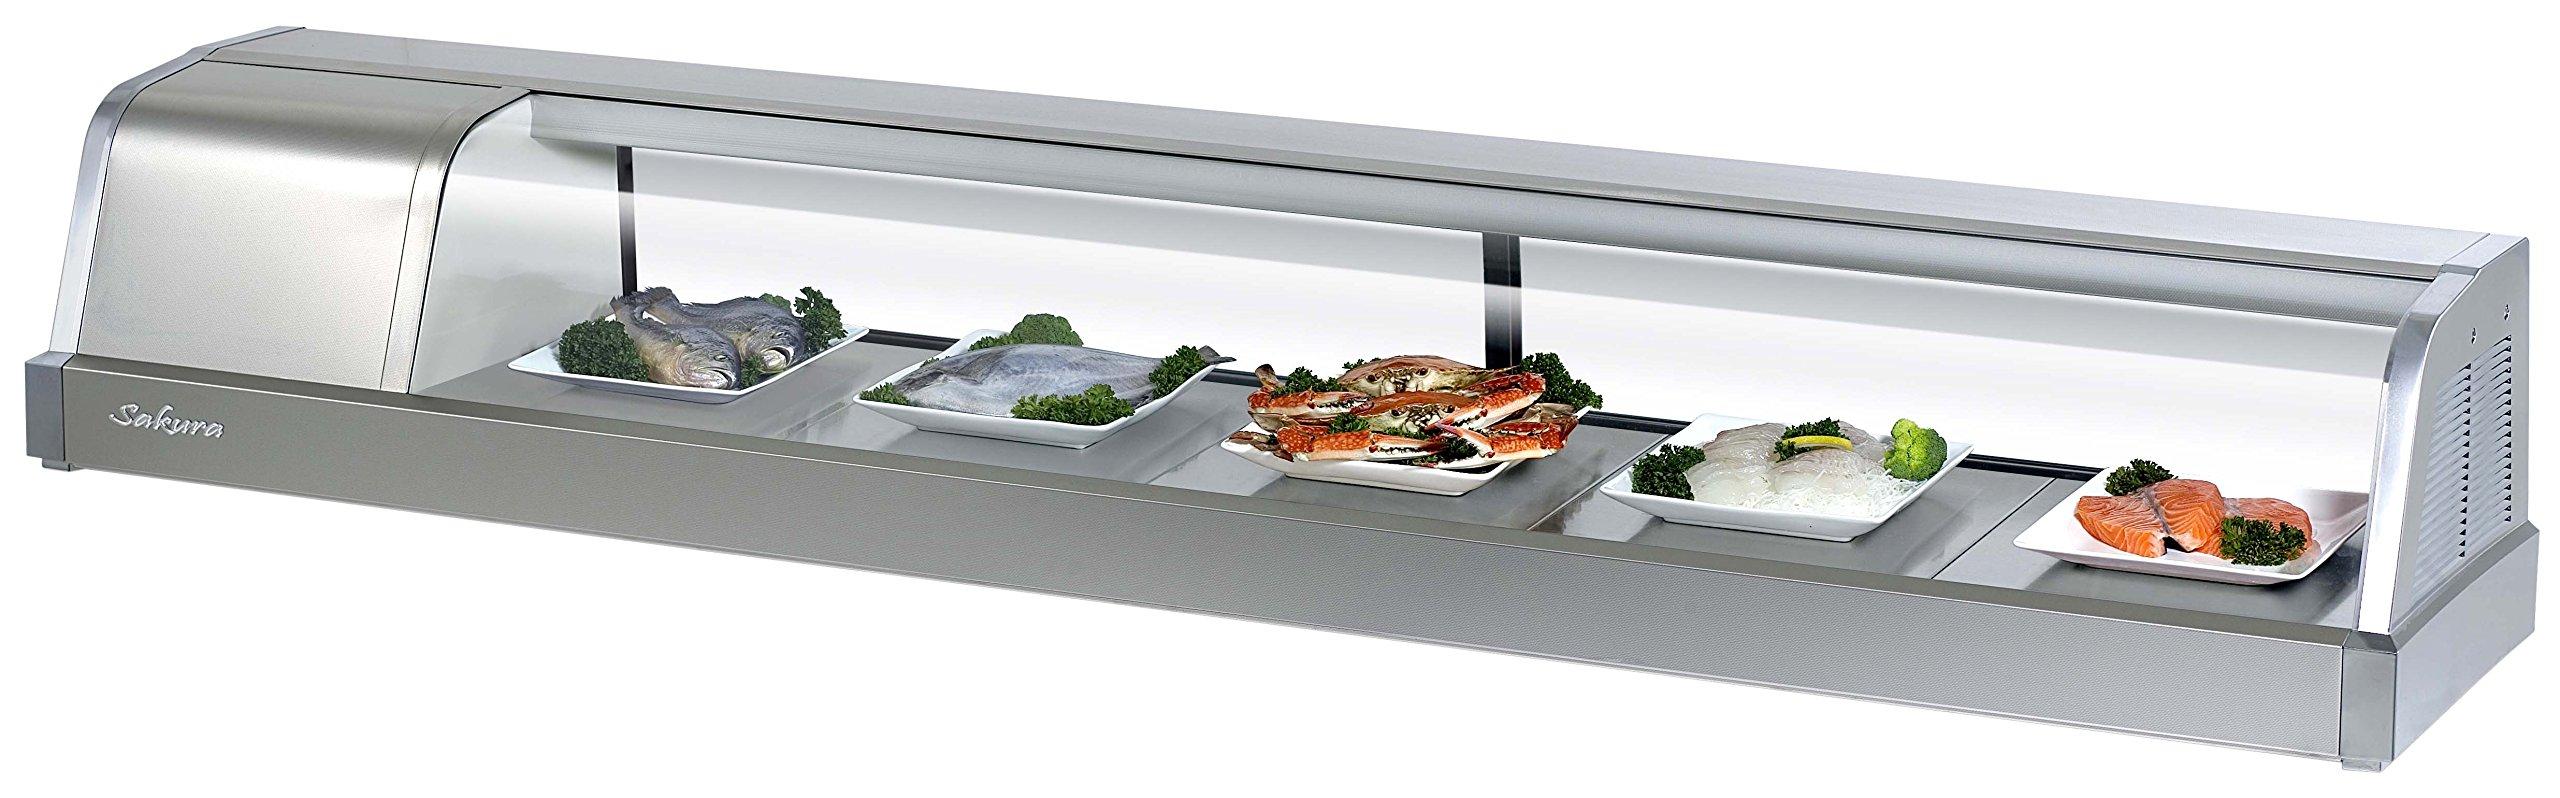 Turbo Air SAKURA-70 Sushi Display Merchandiser, Four Door, 2.1 cu ft